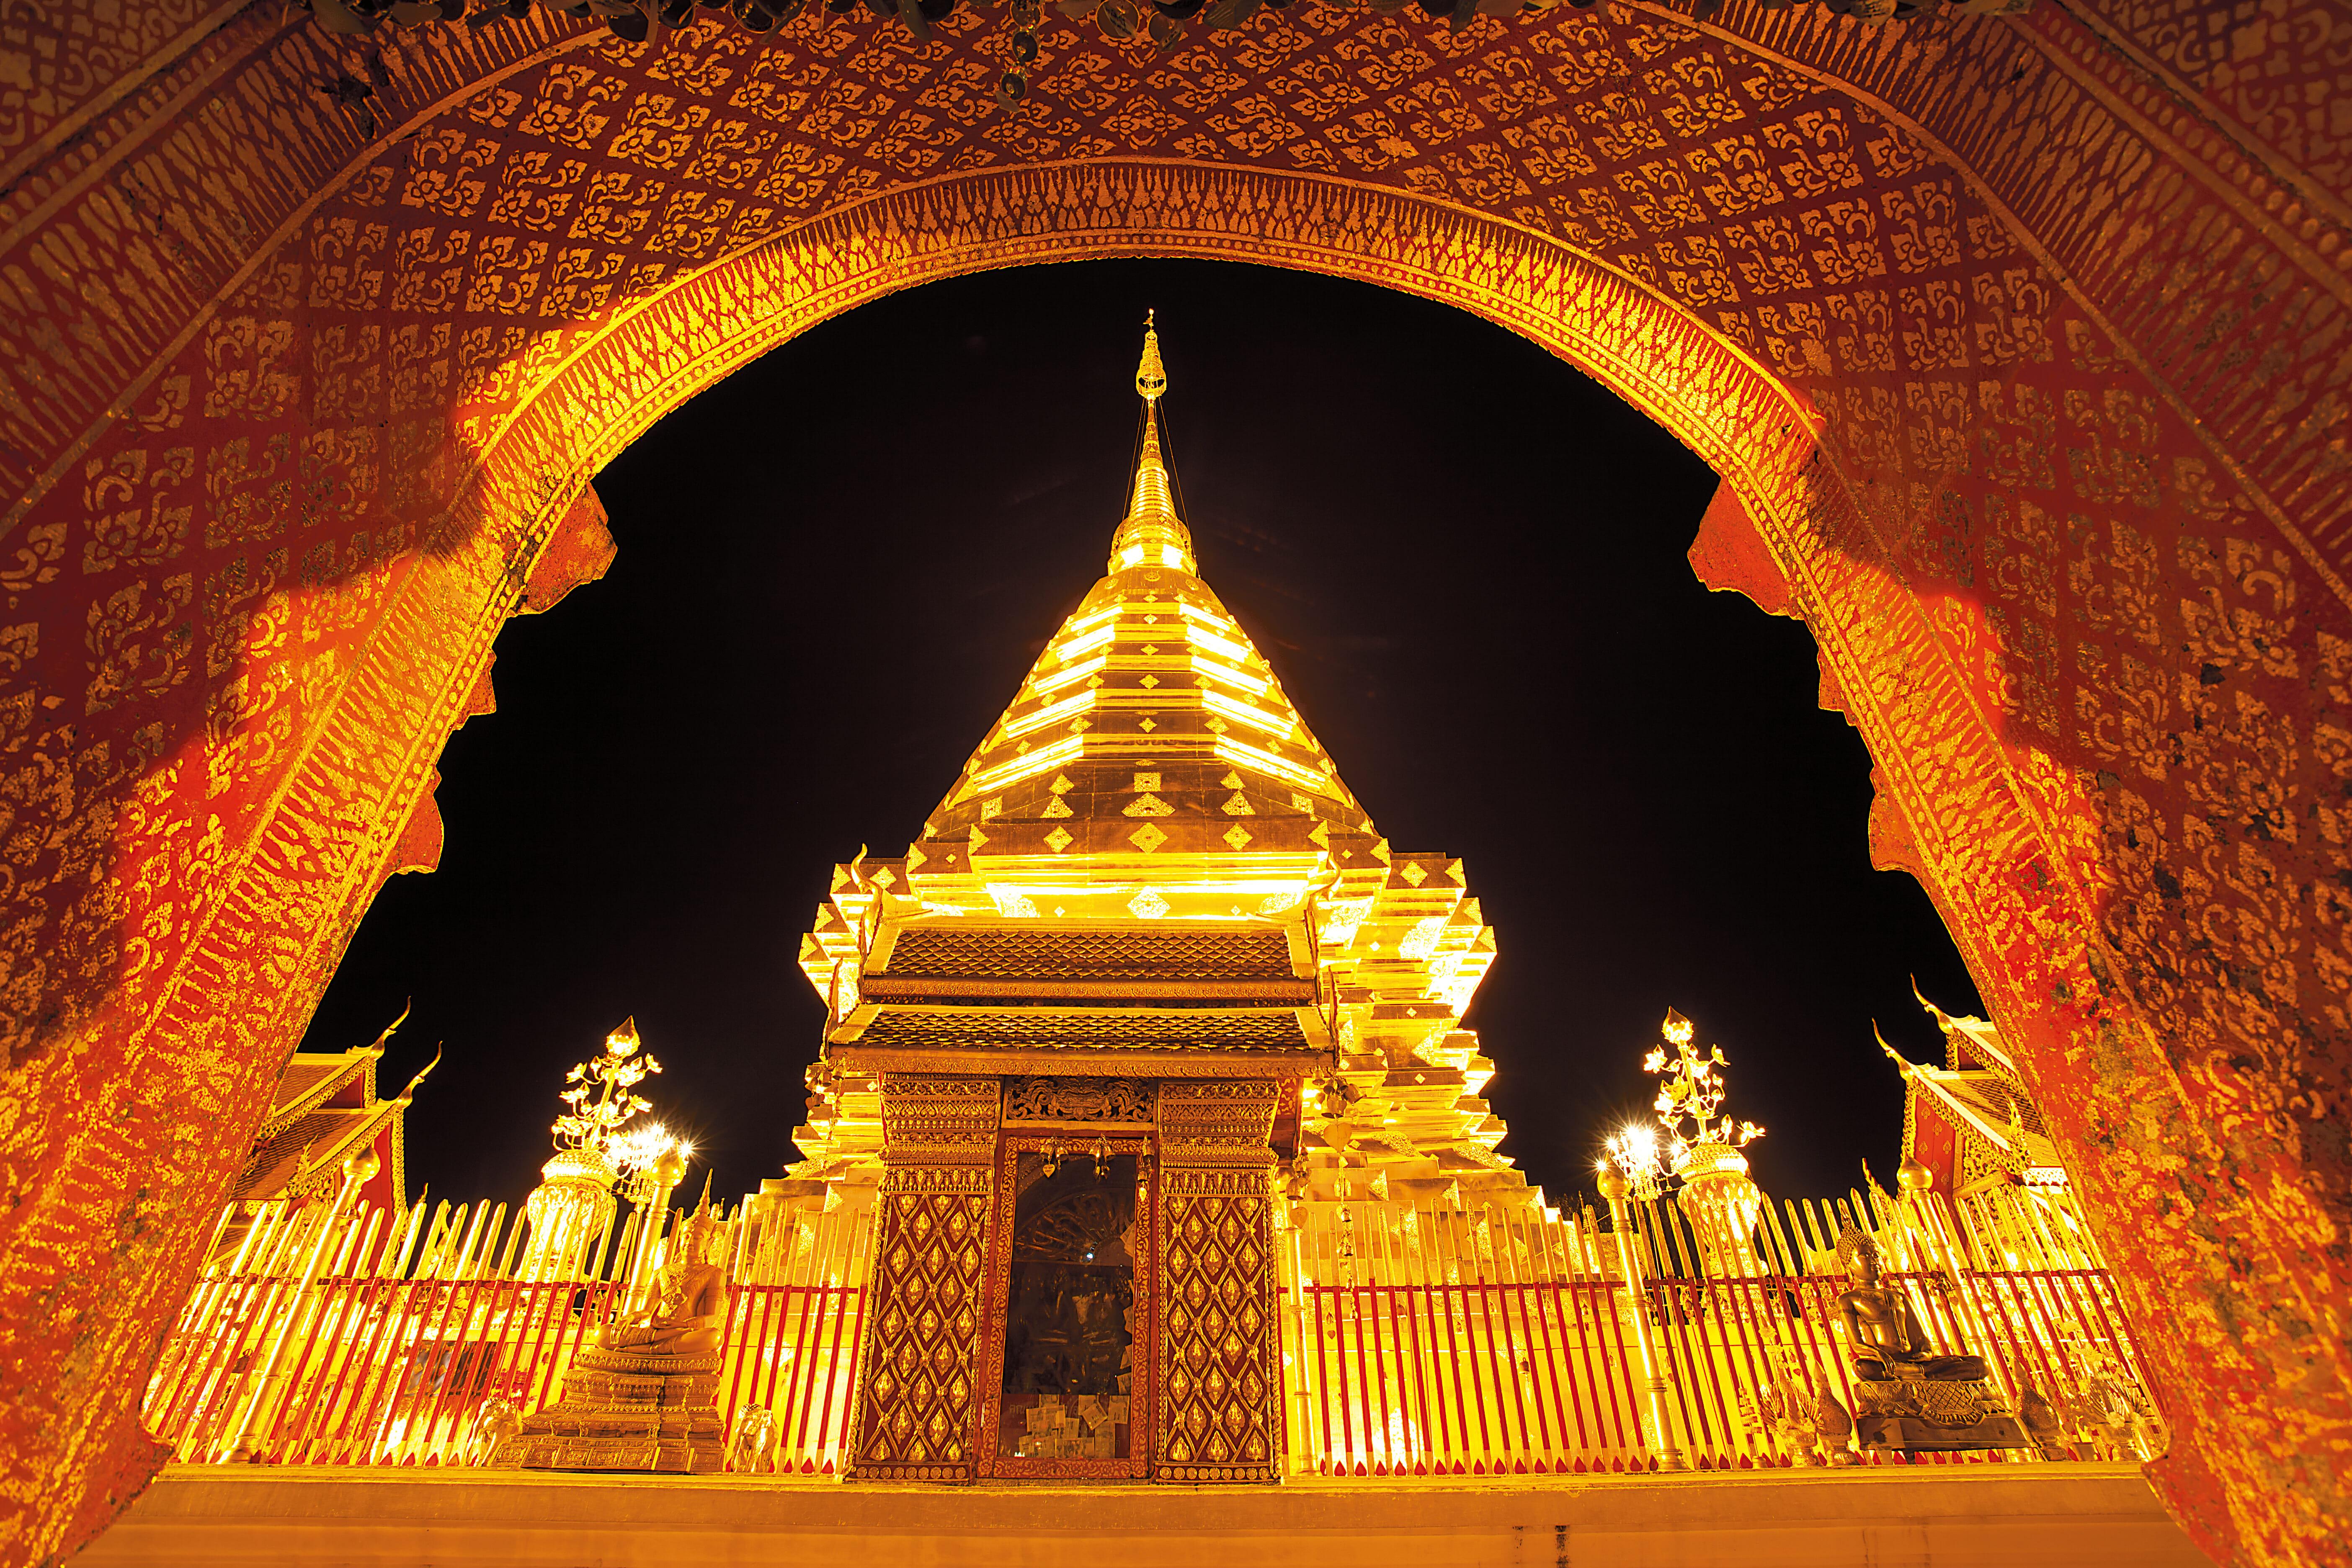 89 Chiang Mai-Wat Phra That Doi Suthep (วัดพระธาตุดอยสุเทพ) 001BB